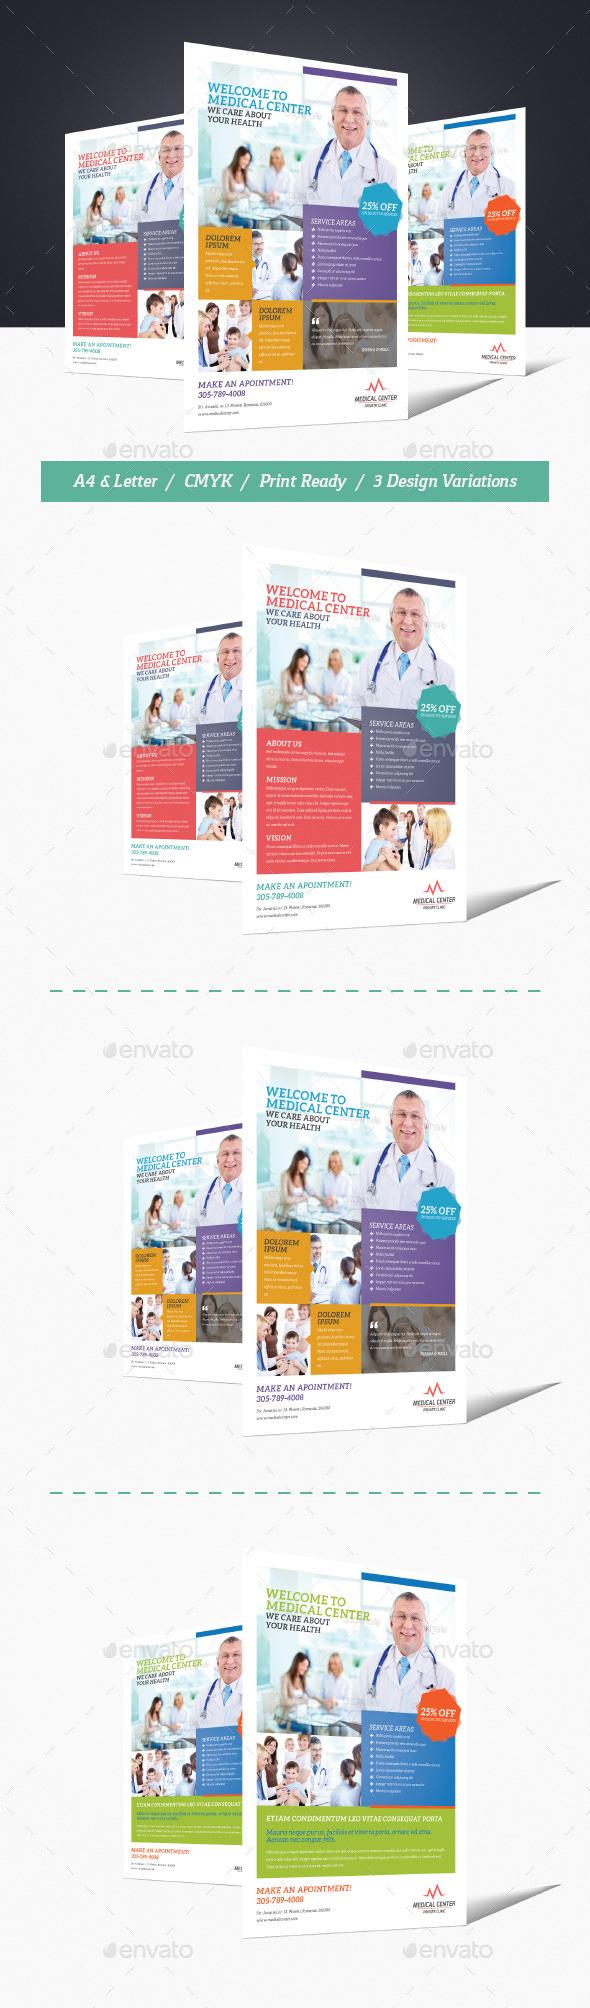 GraphicRiver Medical Center Flyer 9720032